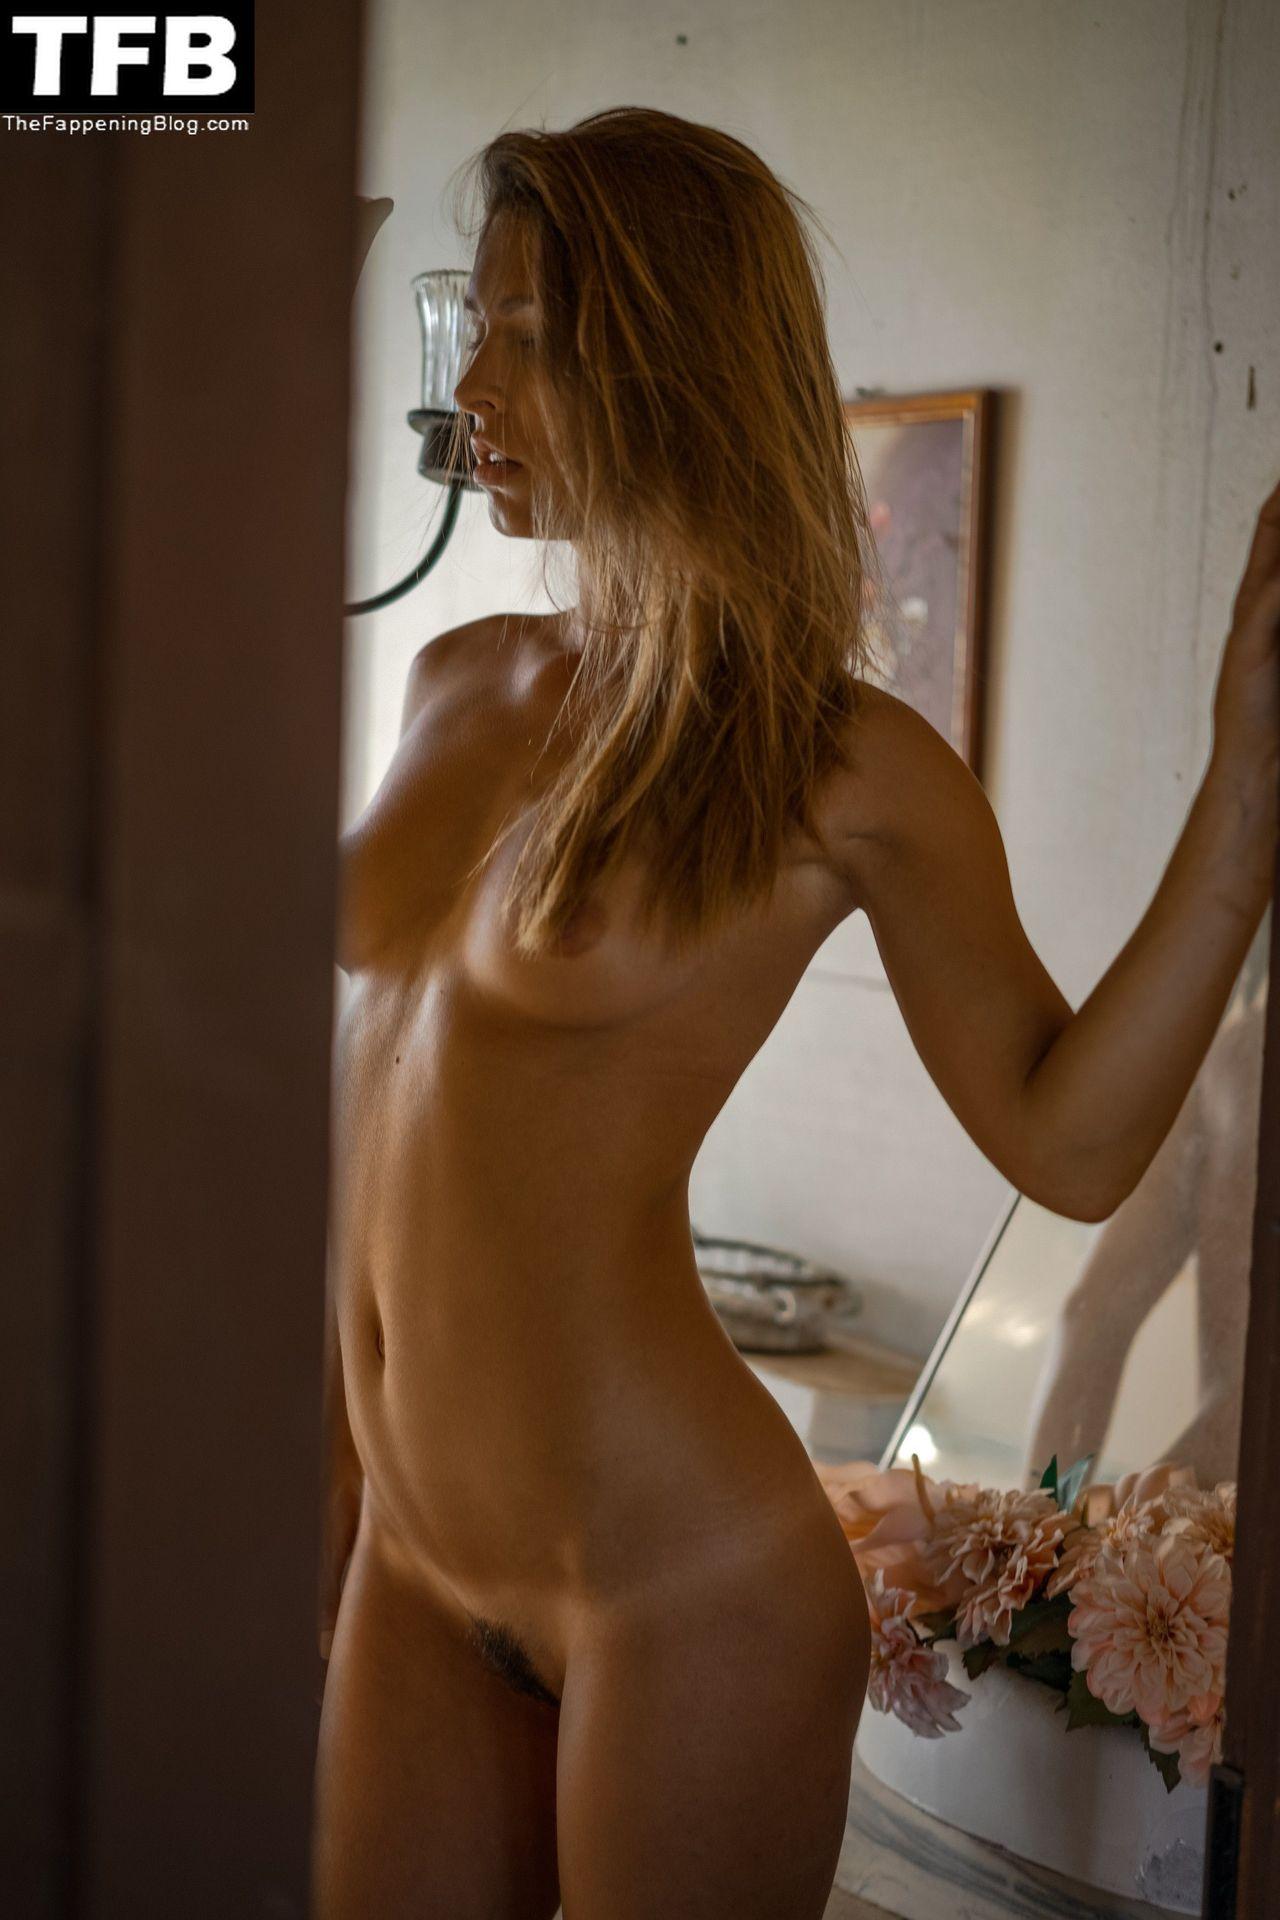 marisa-papen-nude-photos-625911-thefappeningblog.com_.jpg